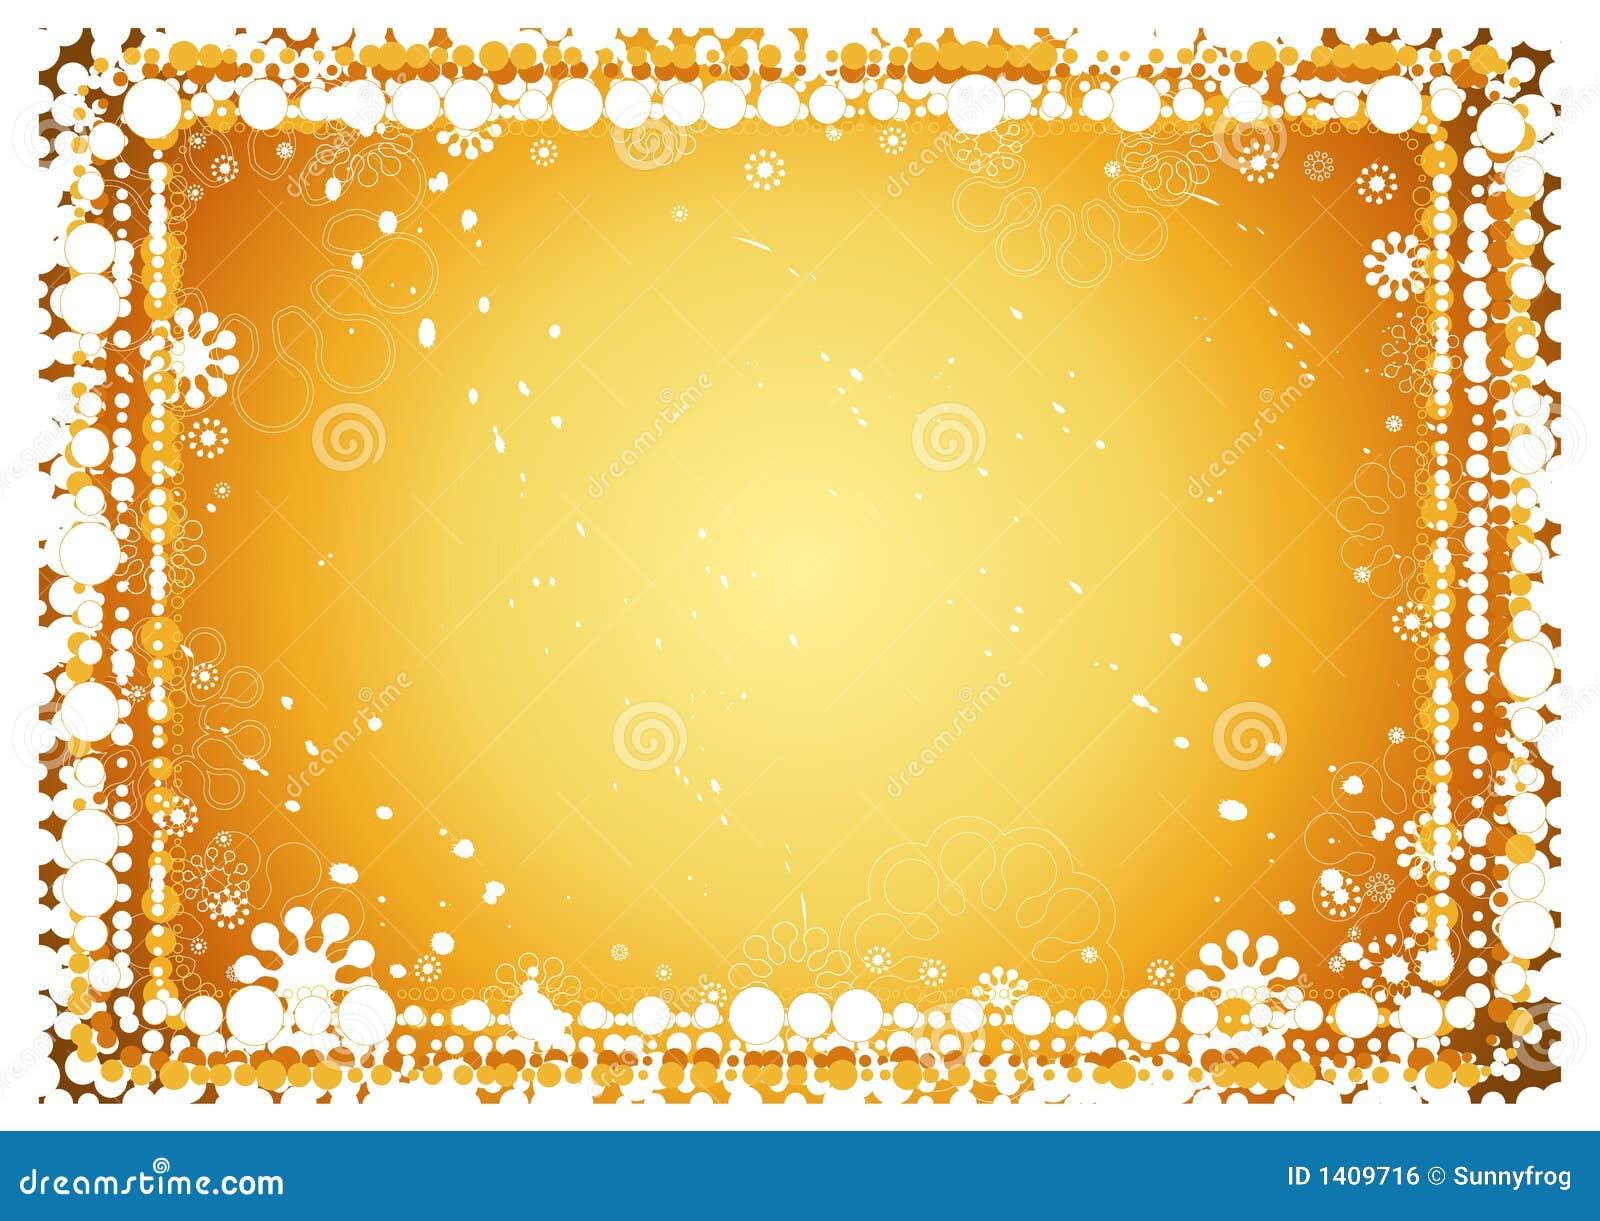 Golden Christmas Background Royalty Free Stock Image ...